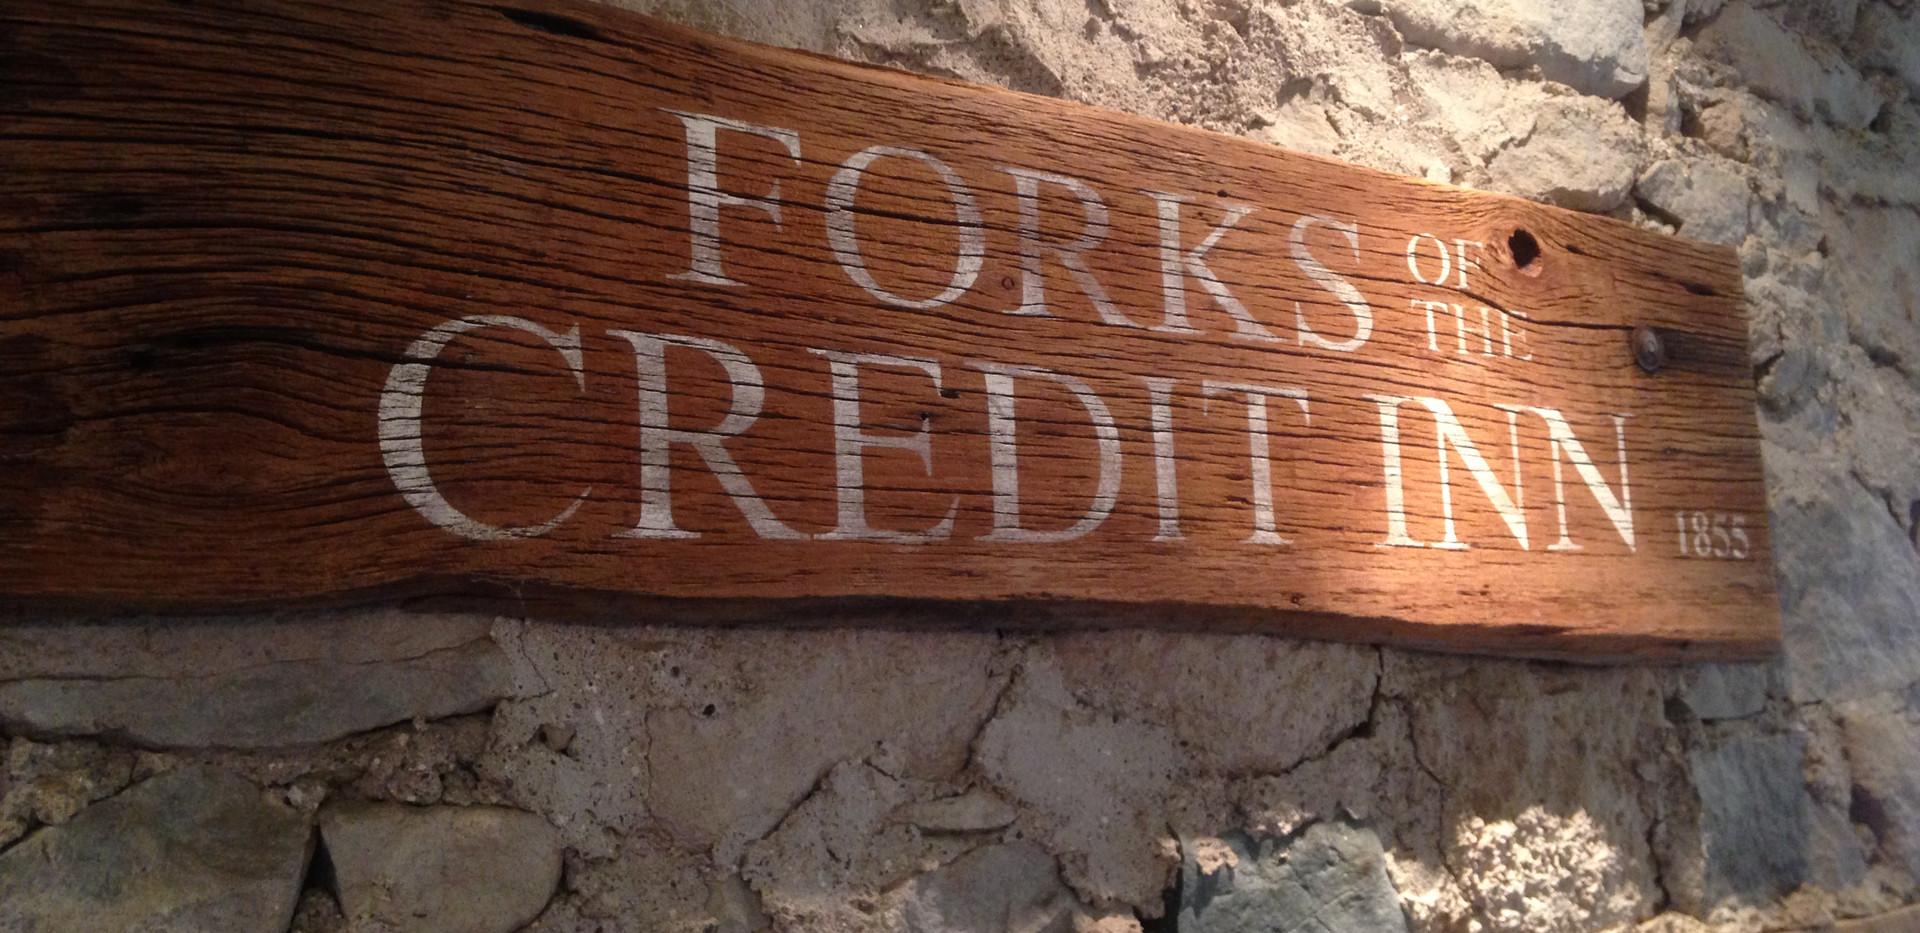 Forks of the Credit Inn